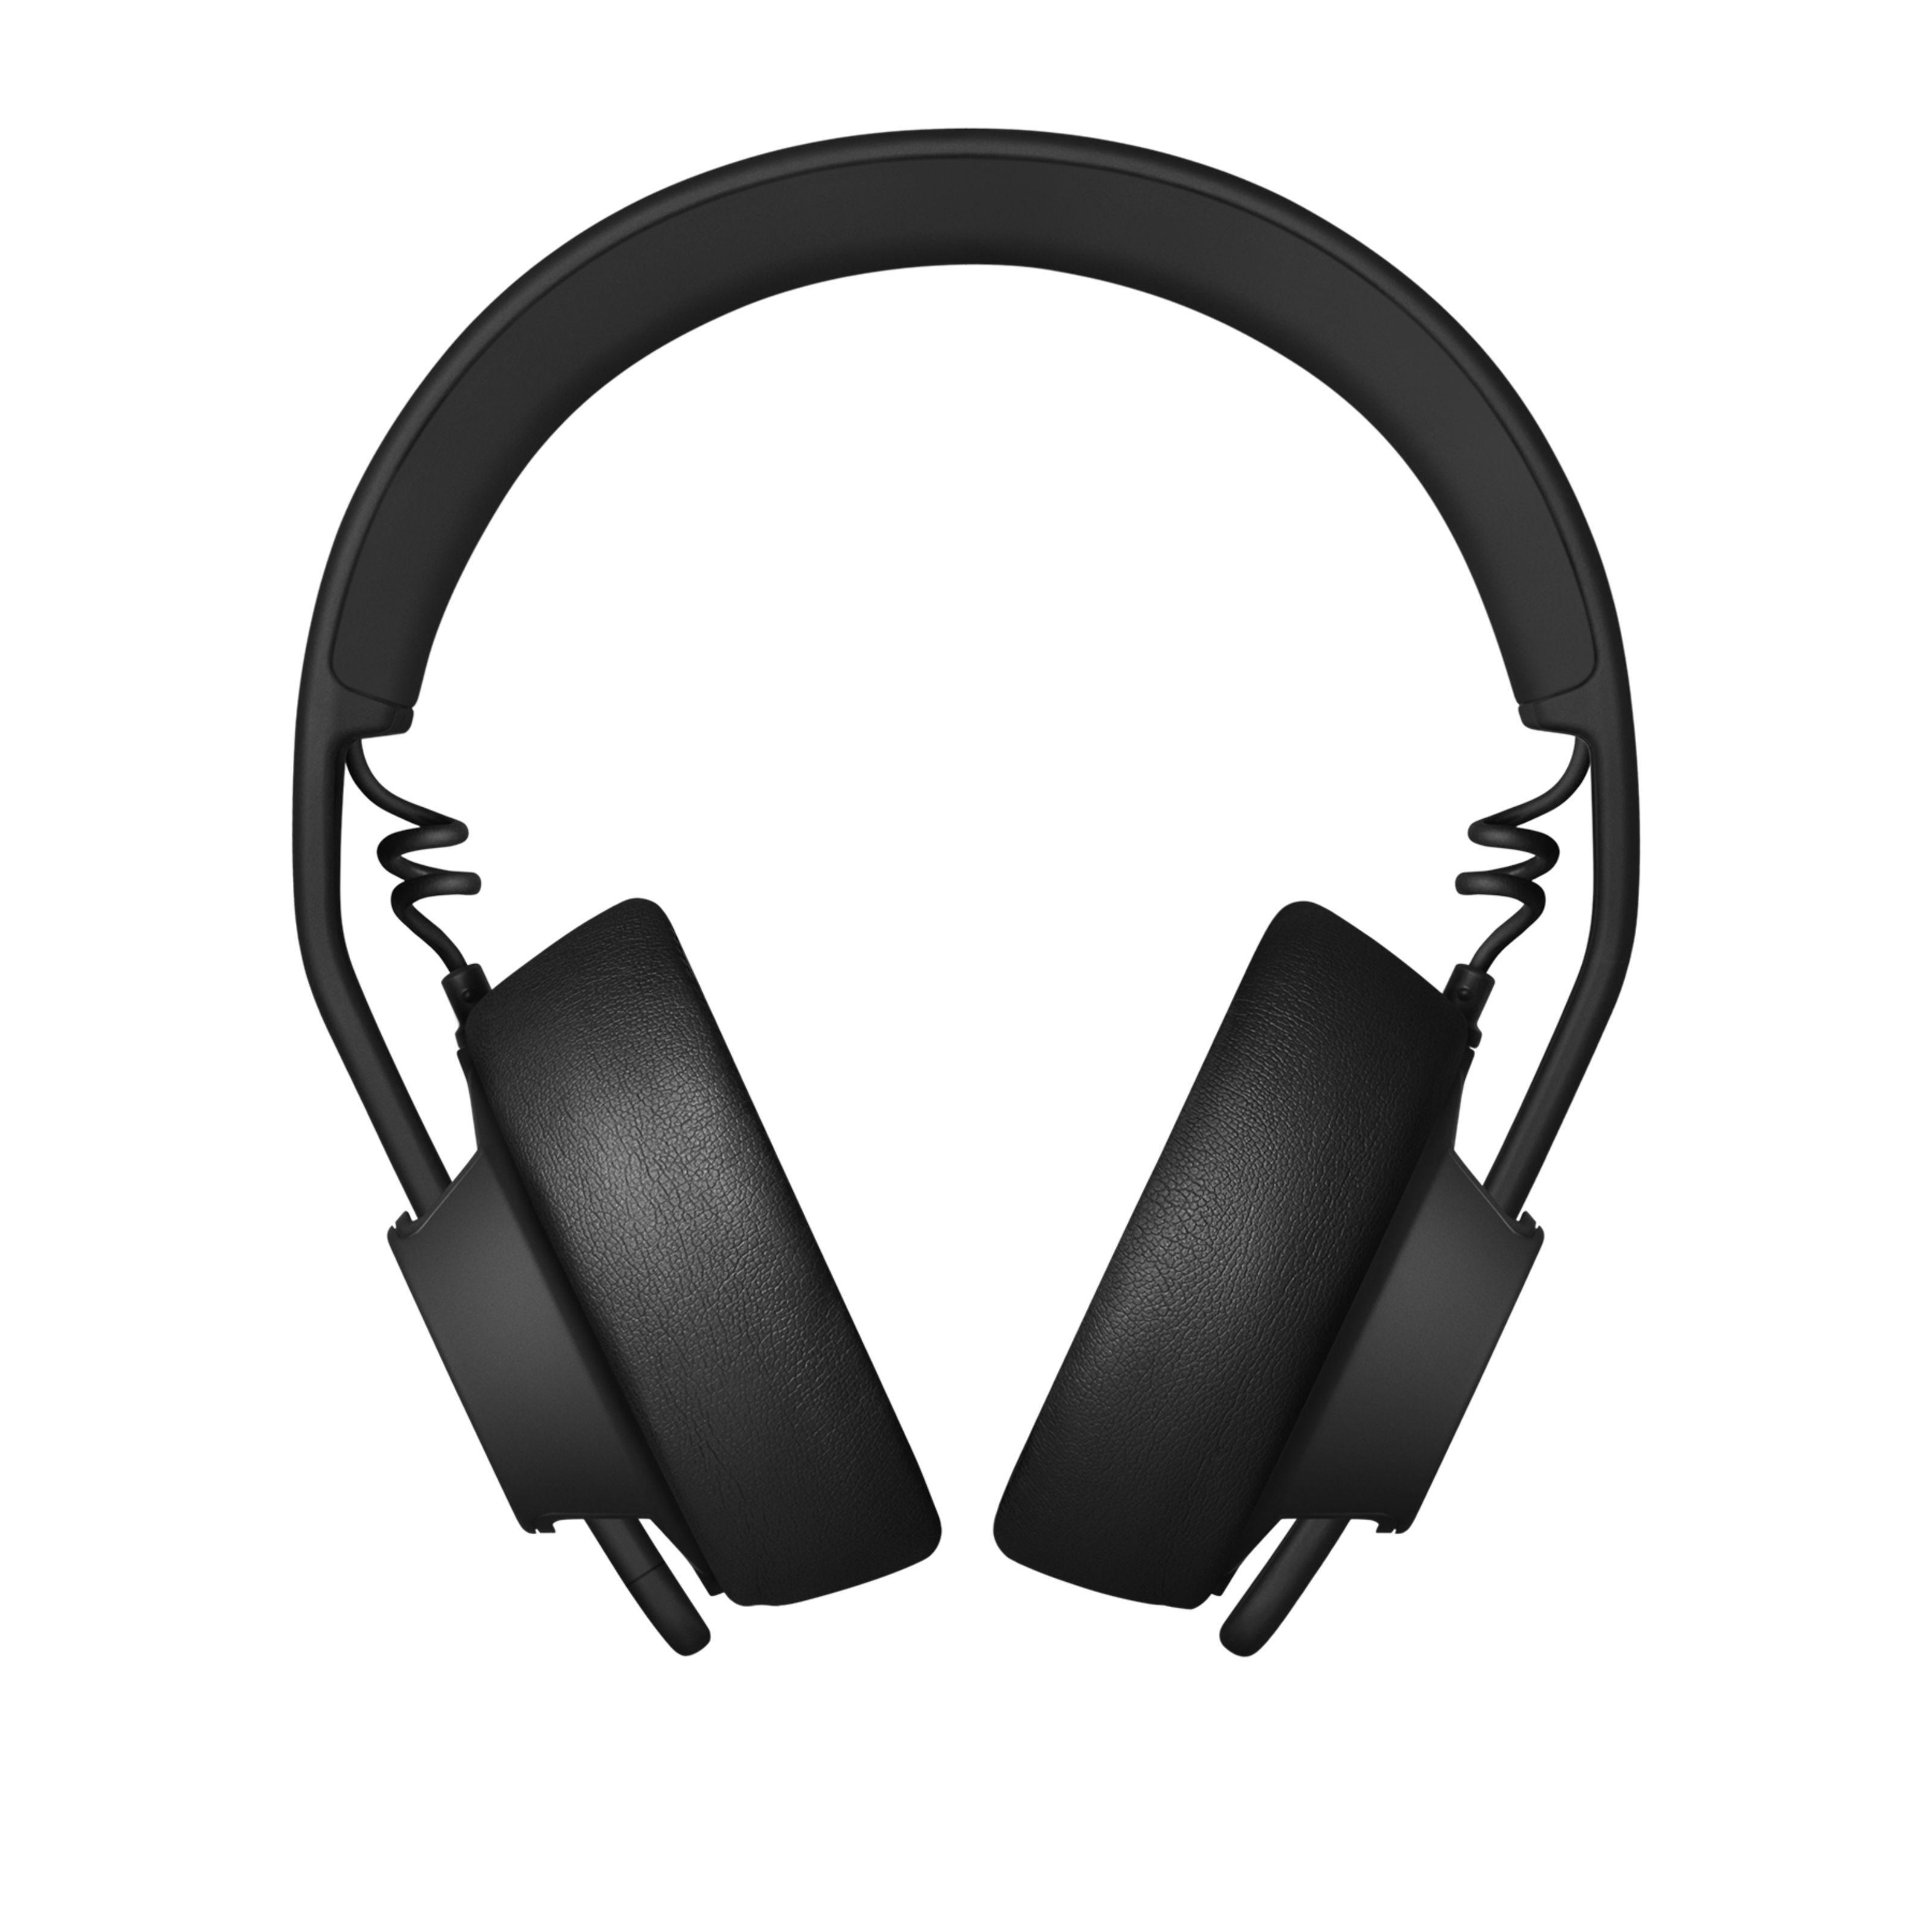 Aiaiai - TMA-2 Comfort Wireless